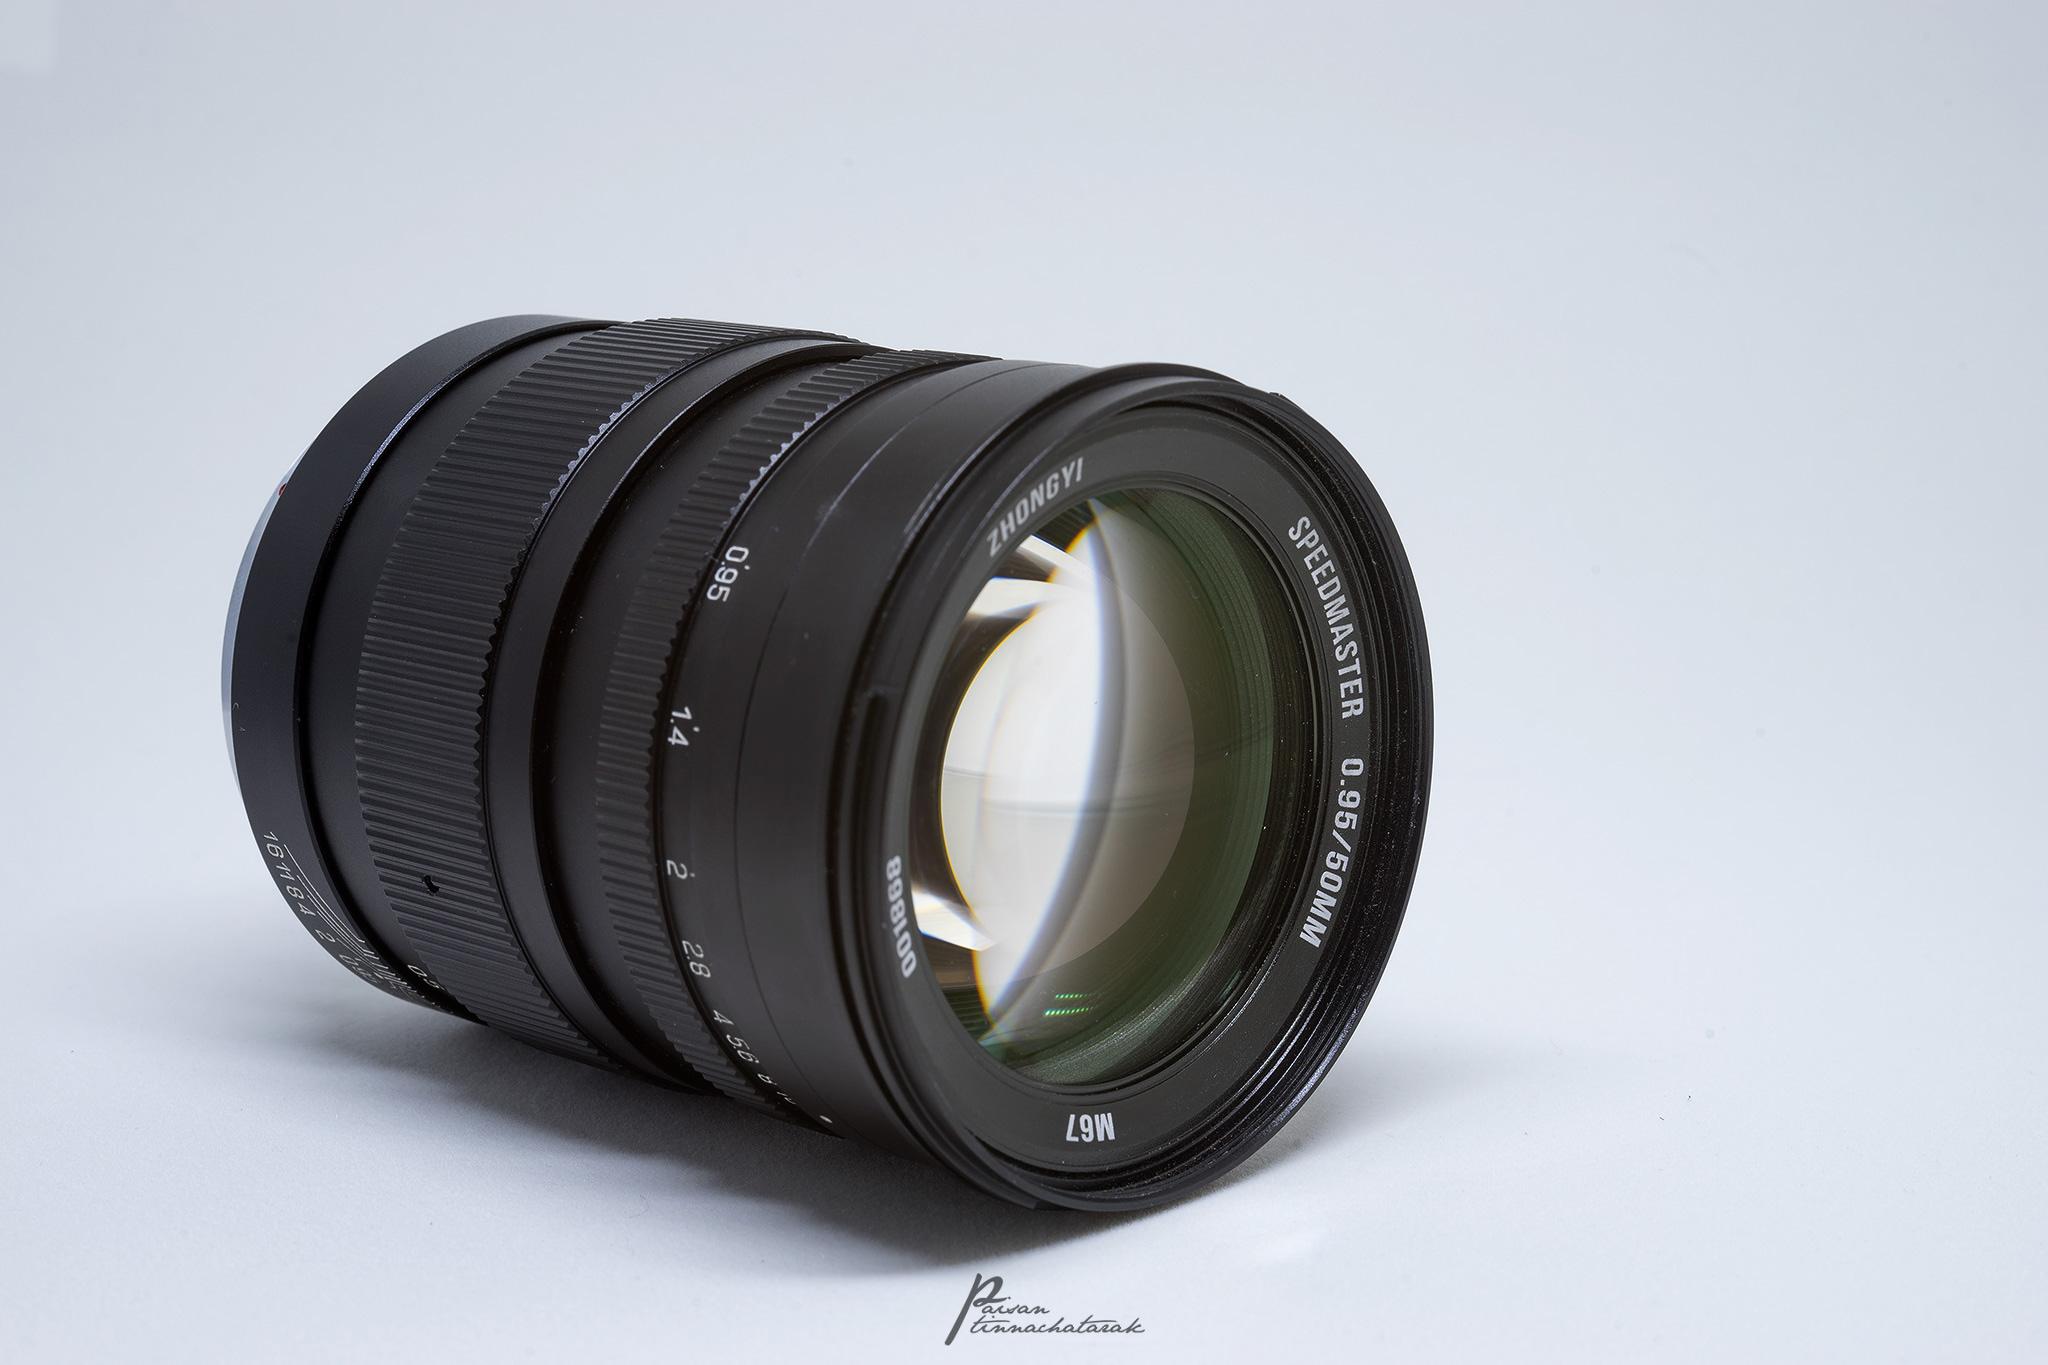 Mitakon 50mm f/0.95 FE